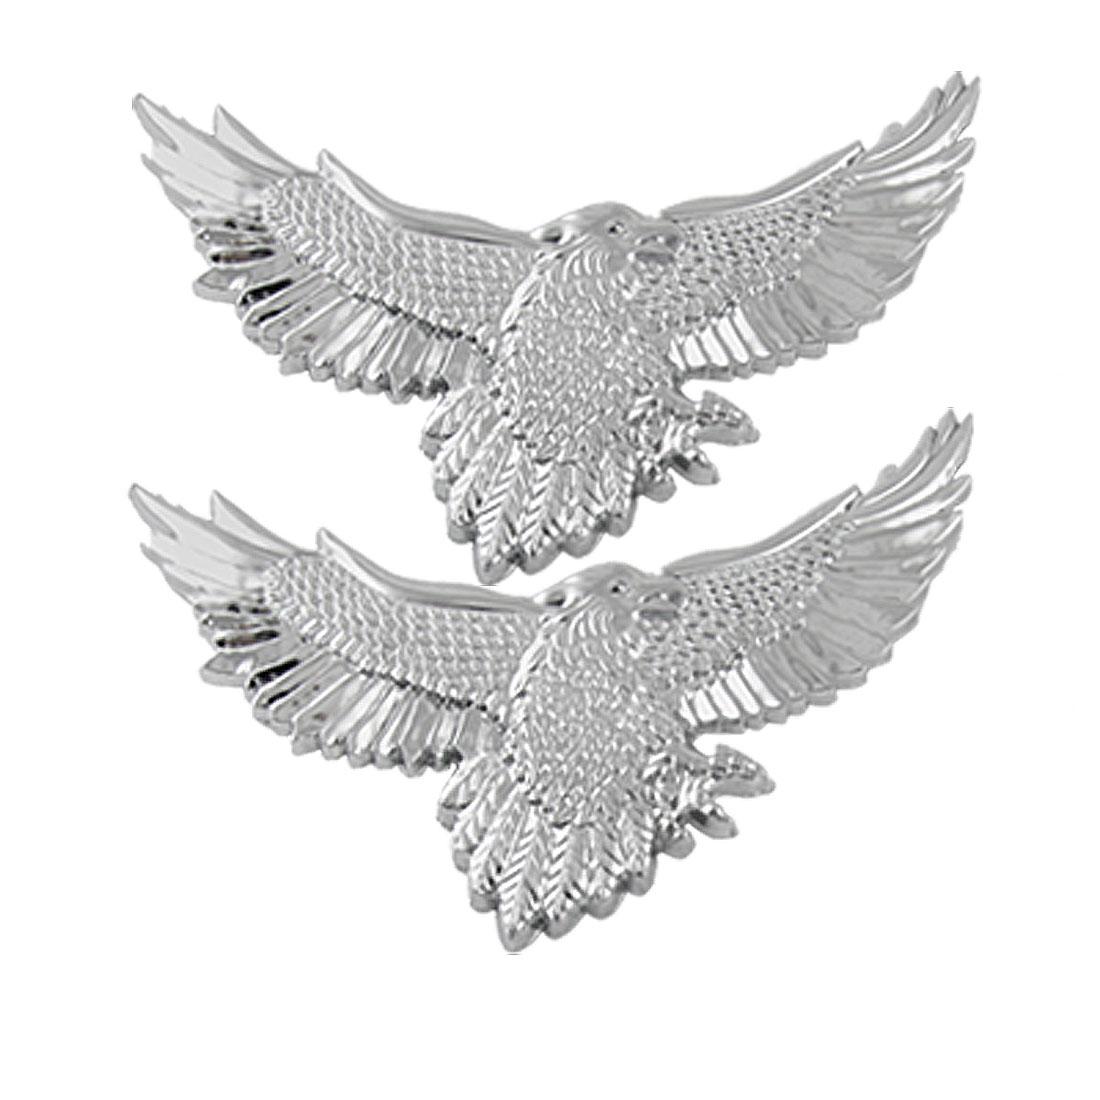 2Pcs Glossy Silver Tone Eagle Adhesive Emblem 3D Sticker Car Badge